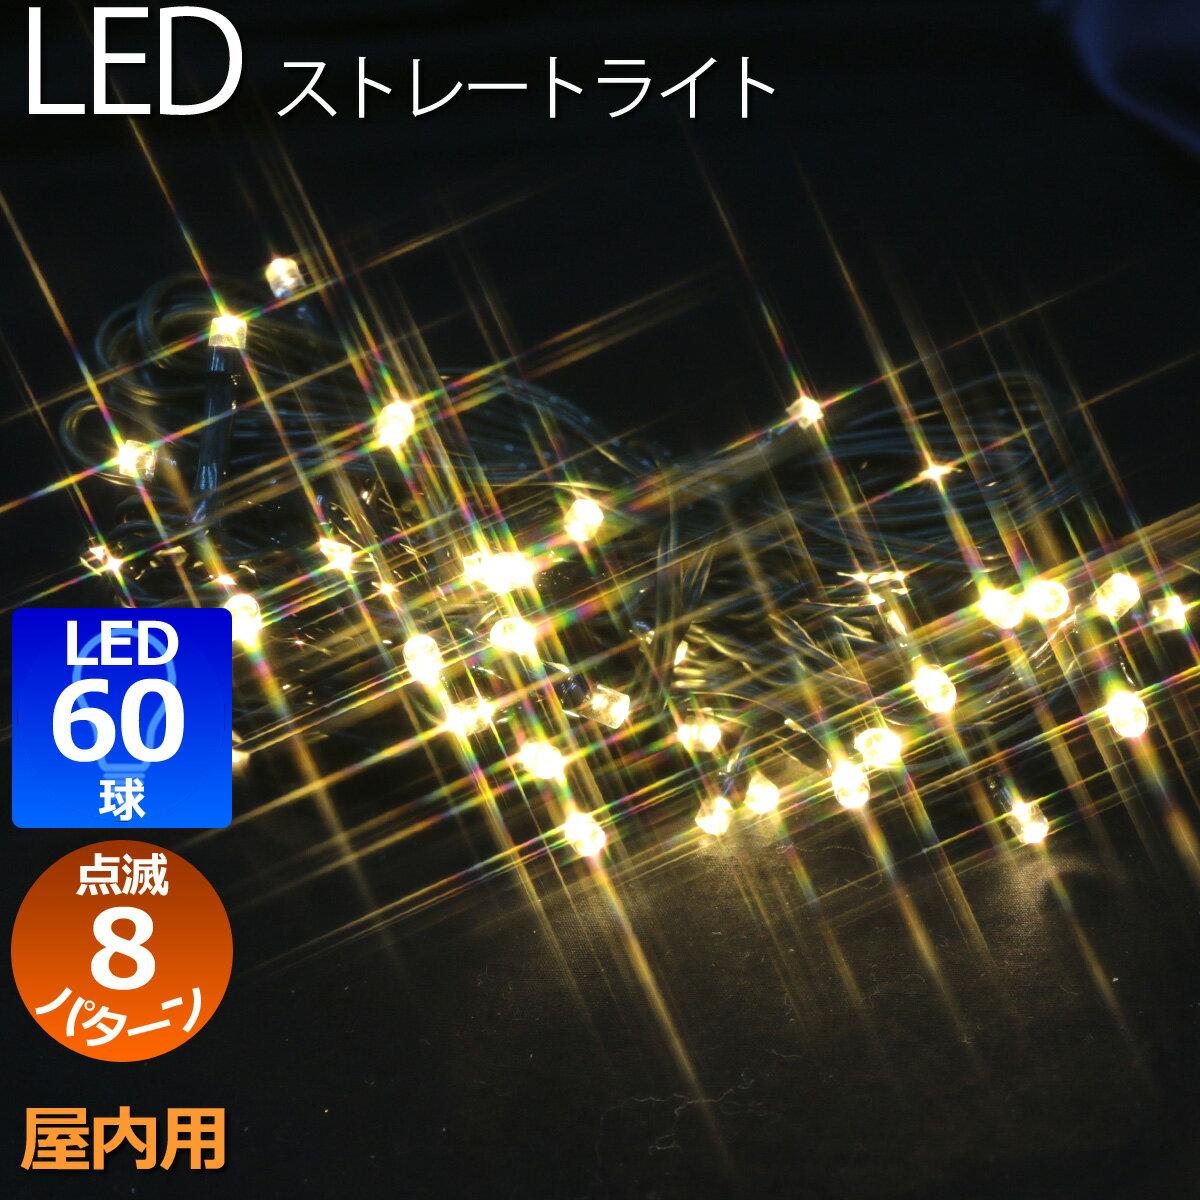 LED ストレートライト 60球 AC電源 防滴仕様 屋外可 LEDライト 【J】